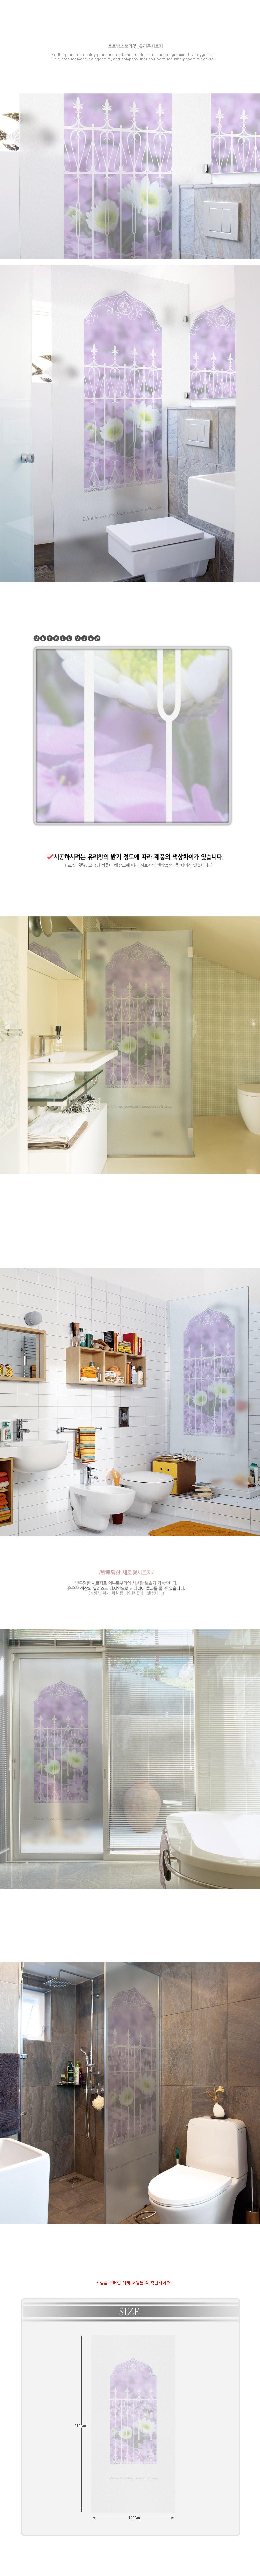 cm824_m-무점착유리시트_프로방스보라꽃_유리문시트지 - 꾸밈, 35,200원, 벽지/시트지, 플라워 시트